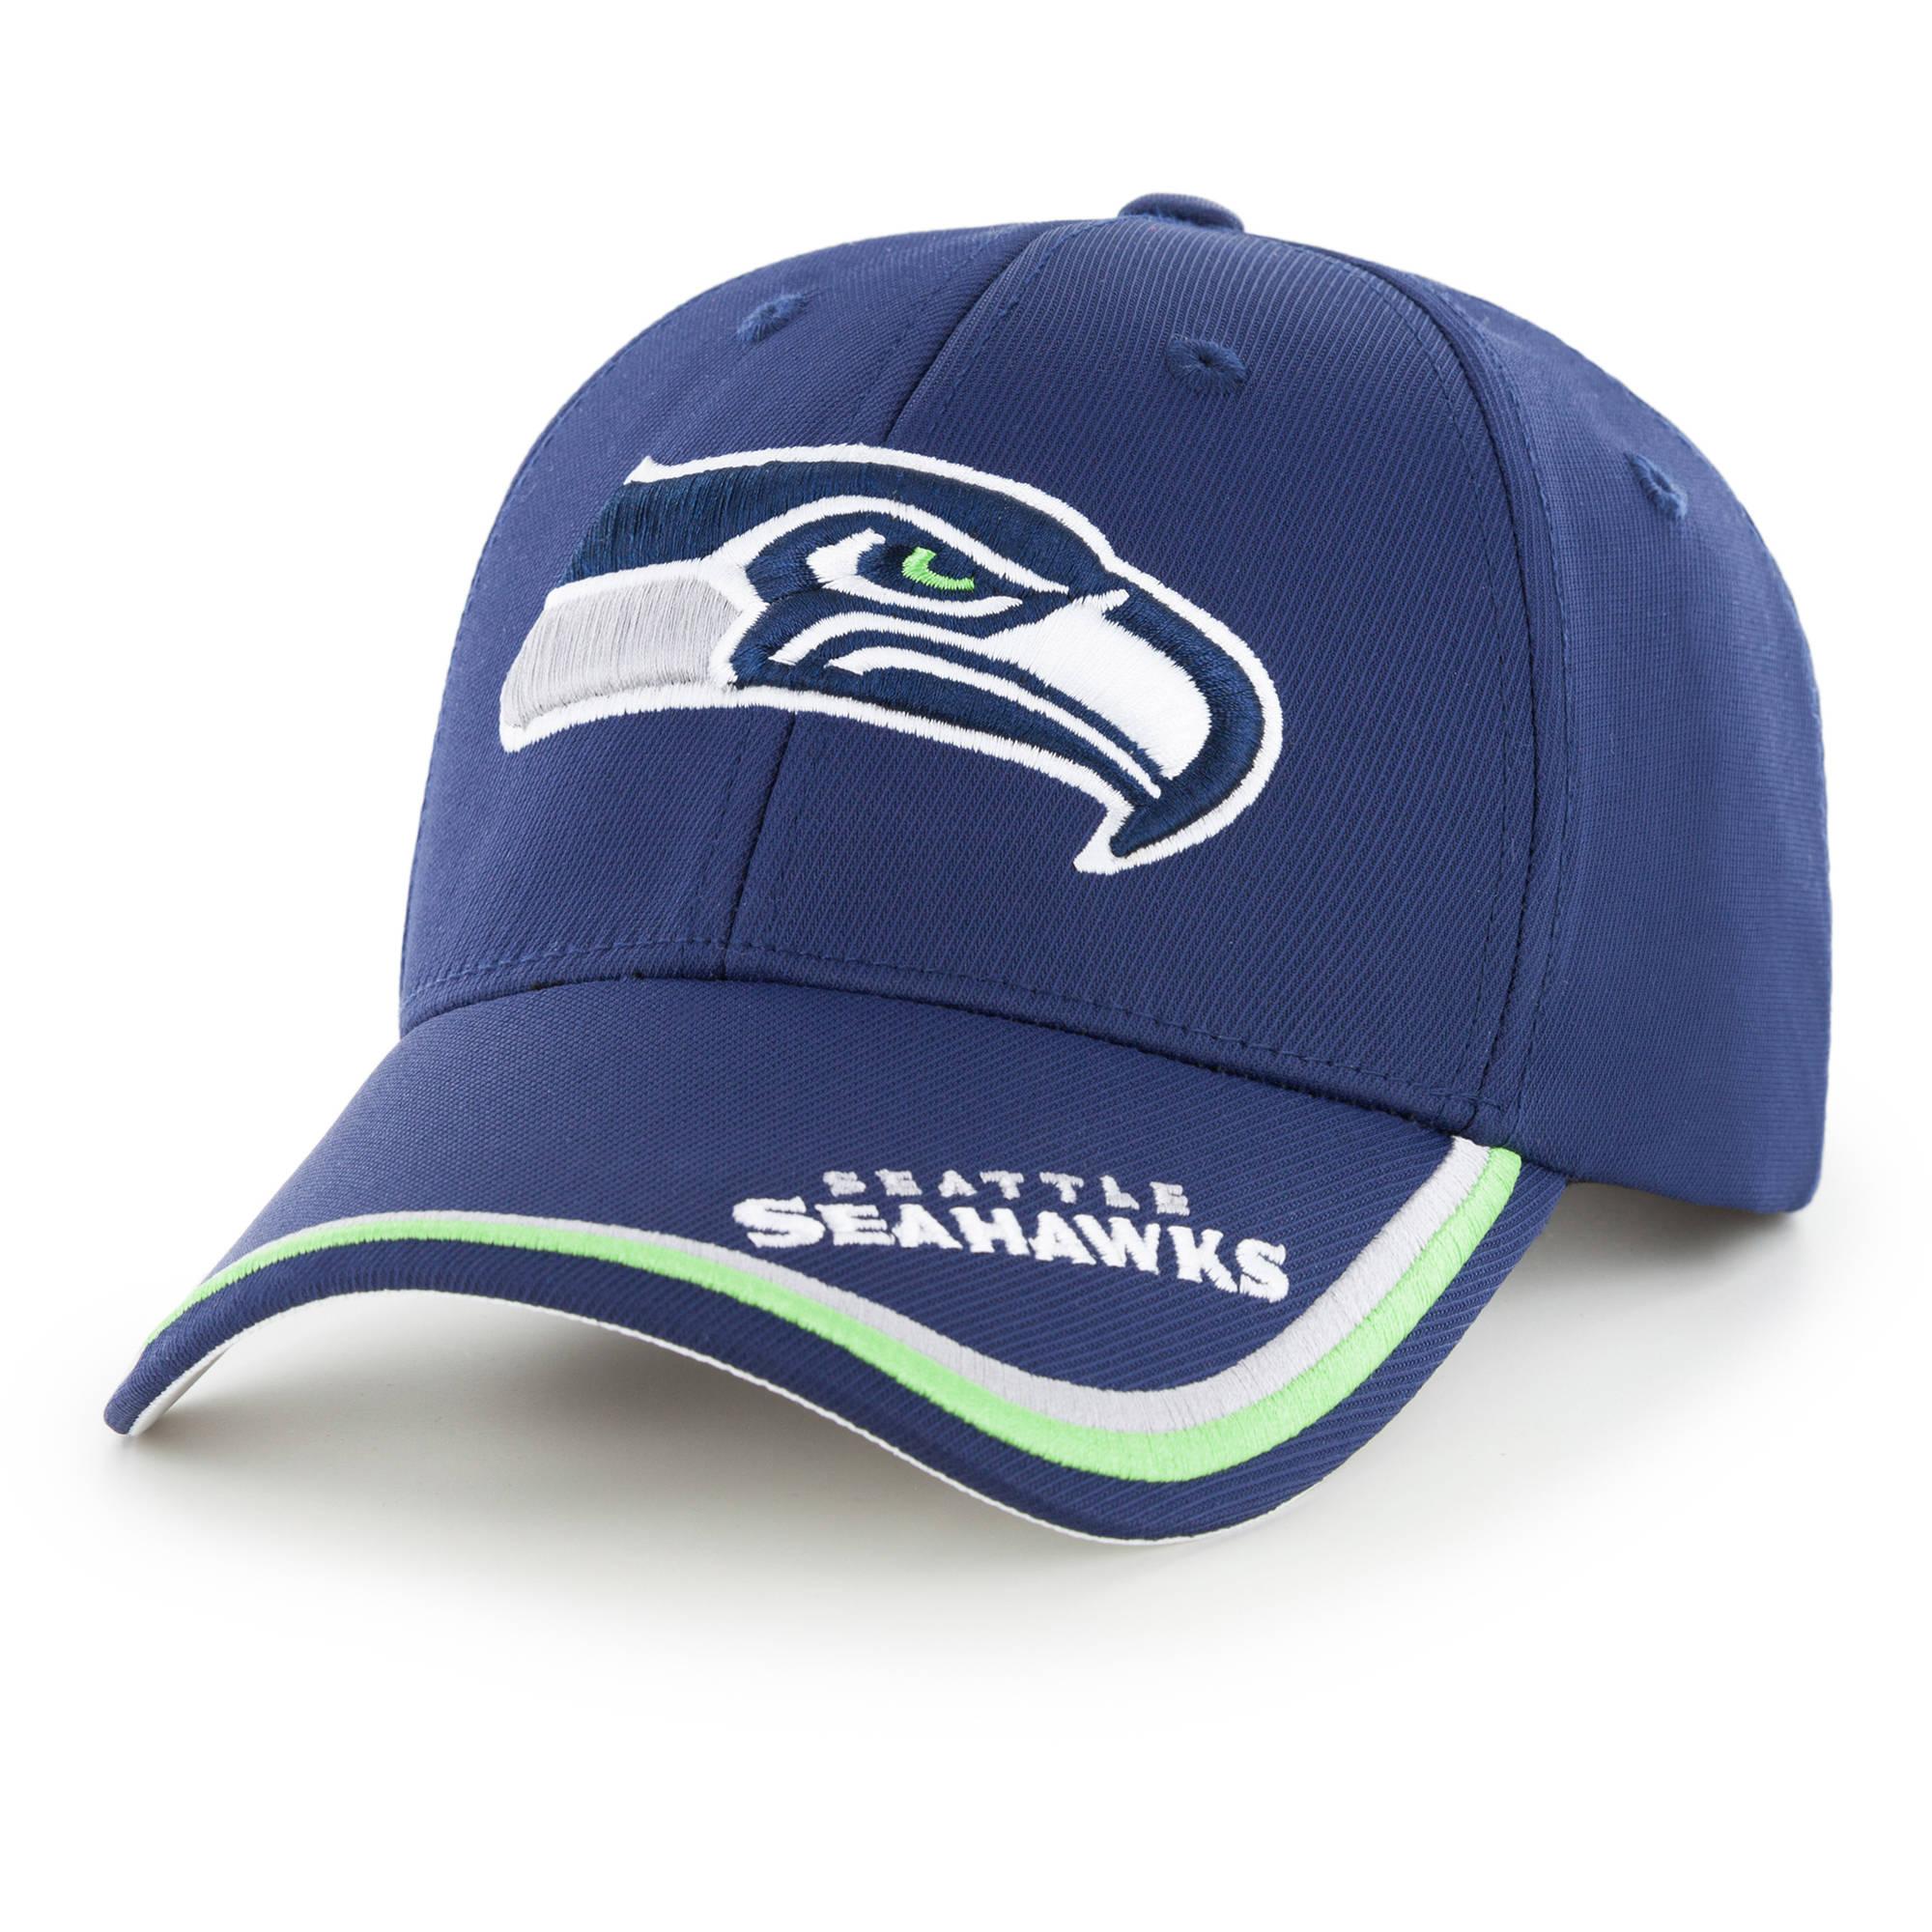 ... official nfl seattle seahawks forest cap hat by fan favorite 20561  0660a ... 55863e8d9958